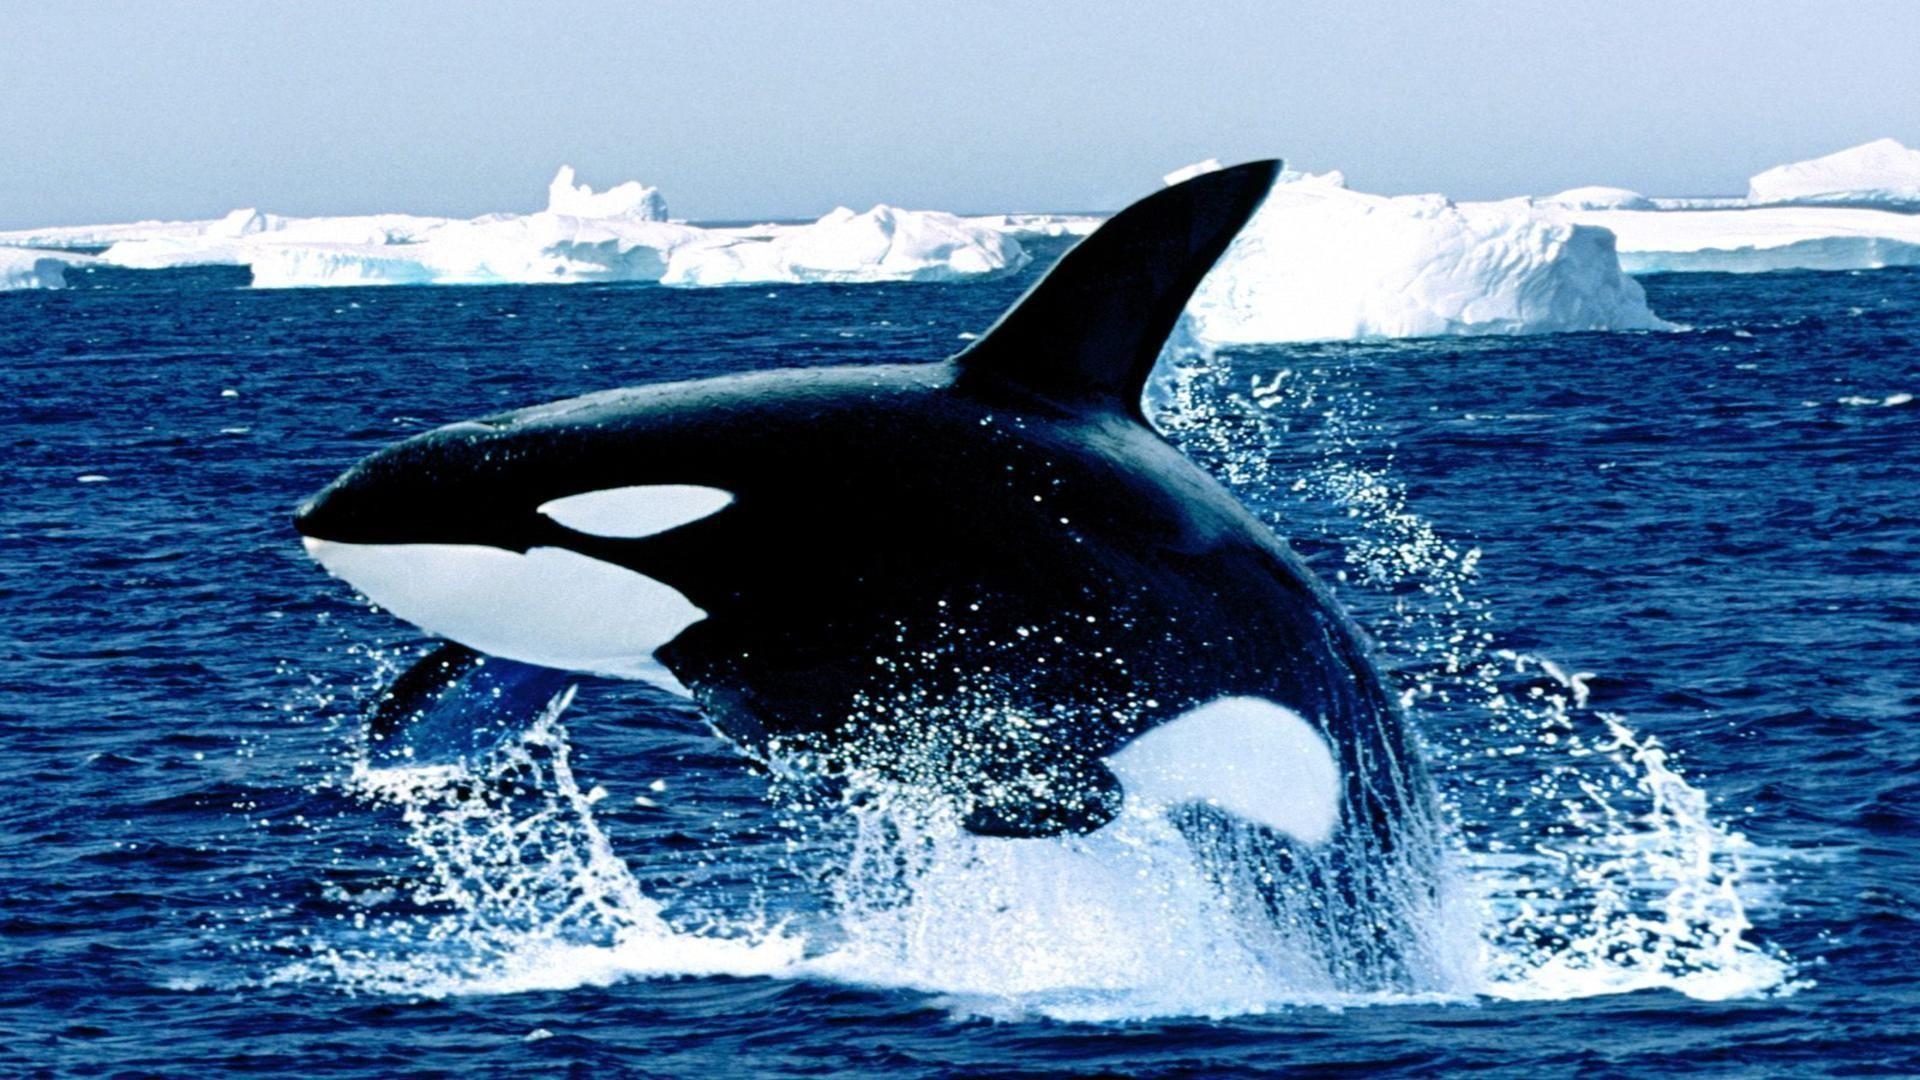 Orca whale wallpaper 56 images 1920x1080 orca whale wallpapers widescreen wallpapers for desktop pinterest killer whales wallpaper altavistaventures Gallery